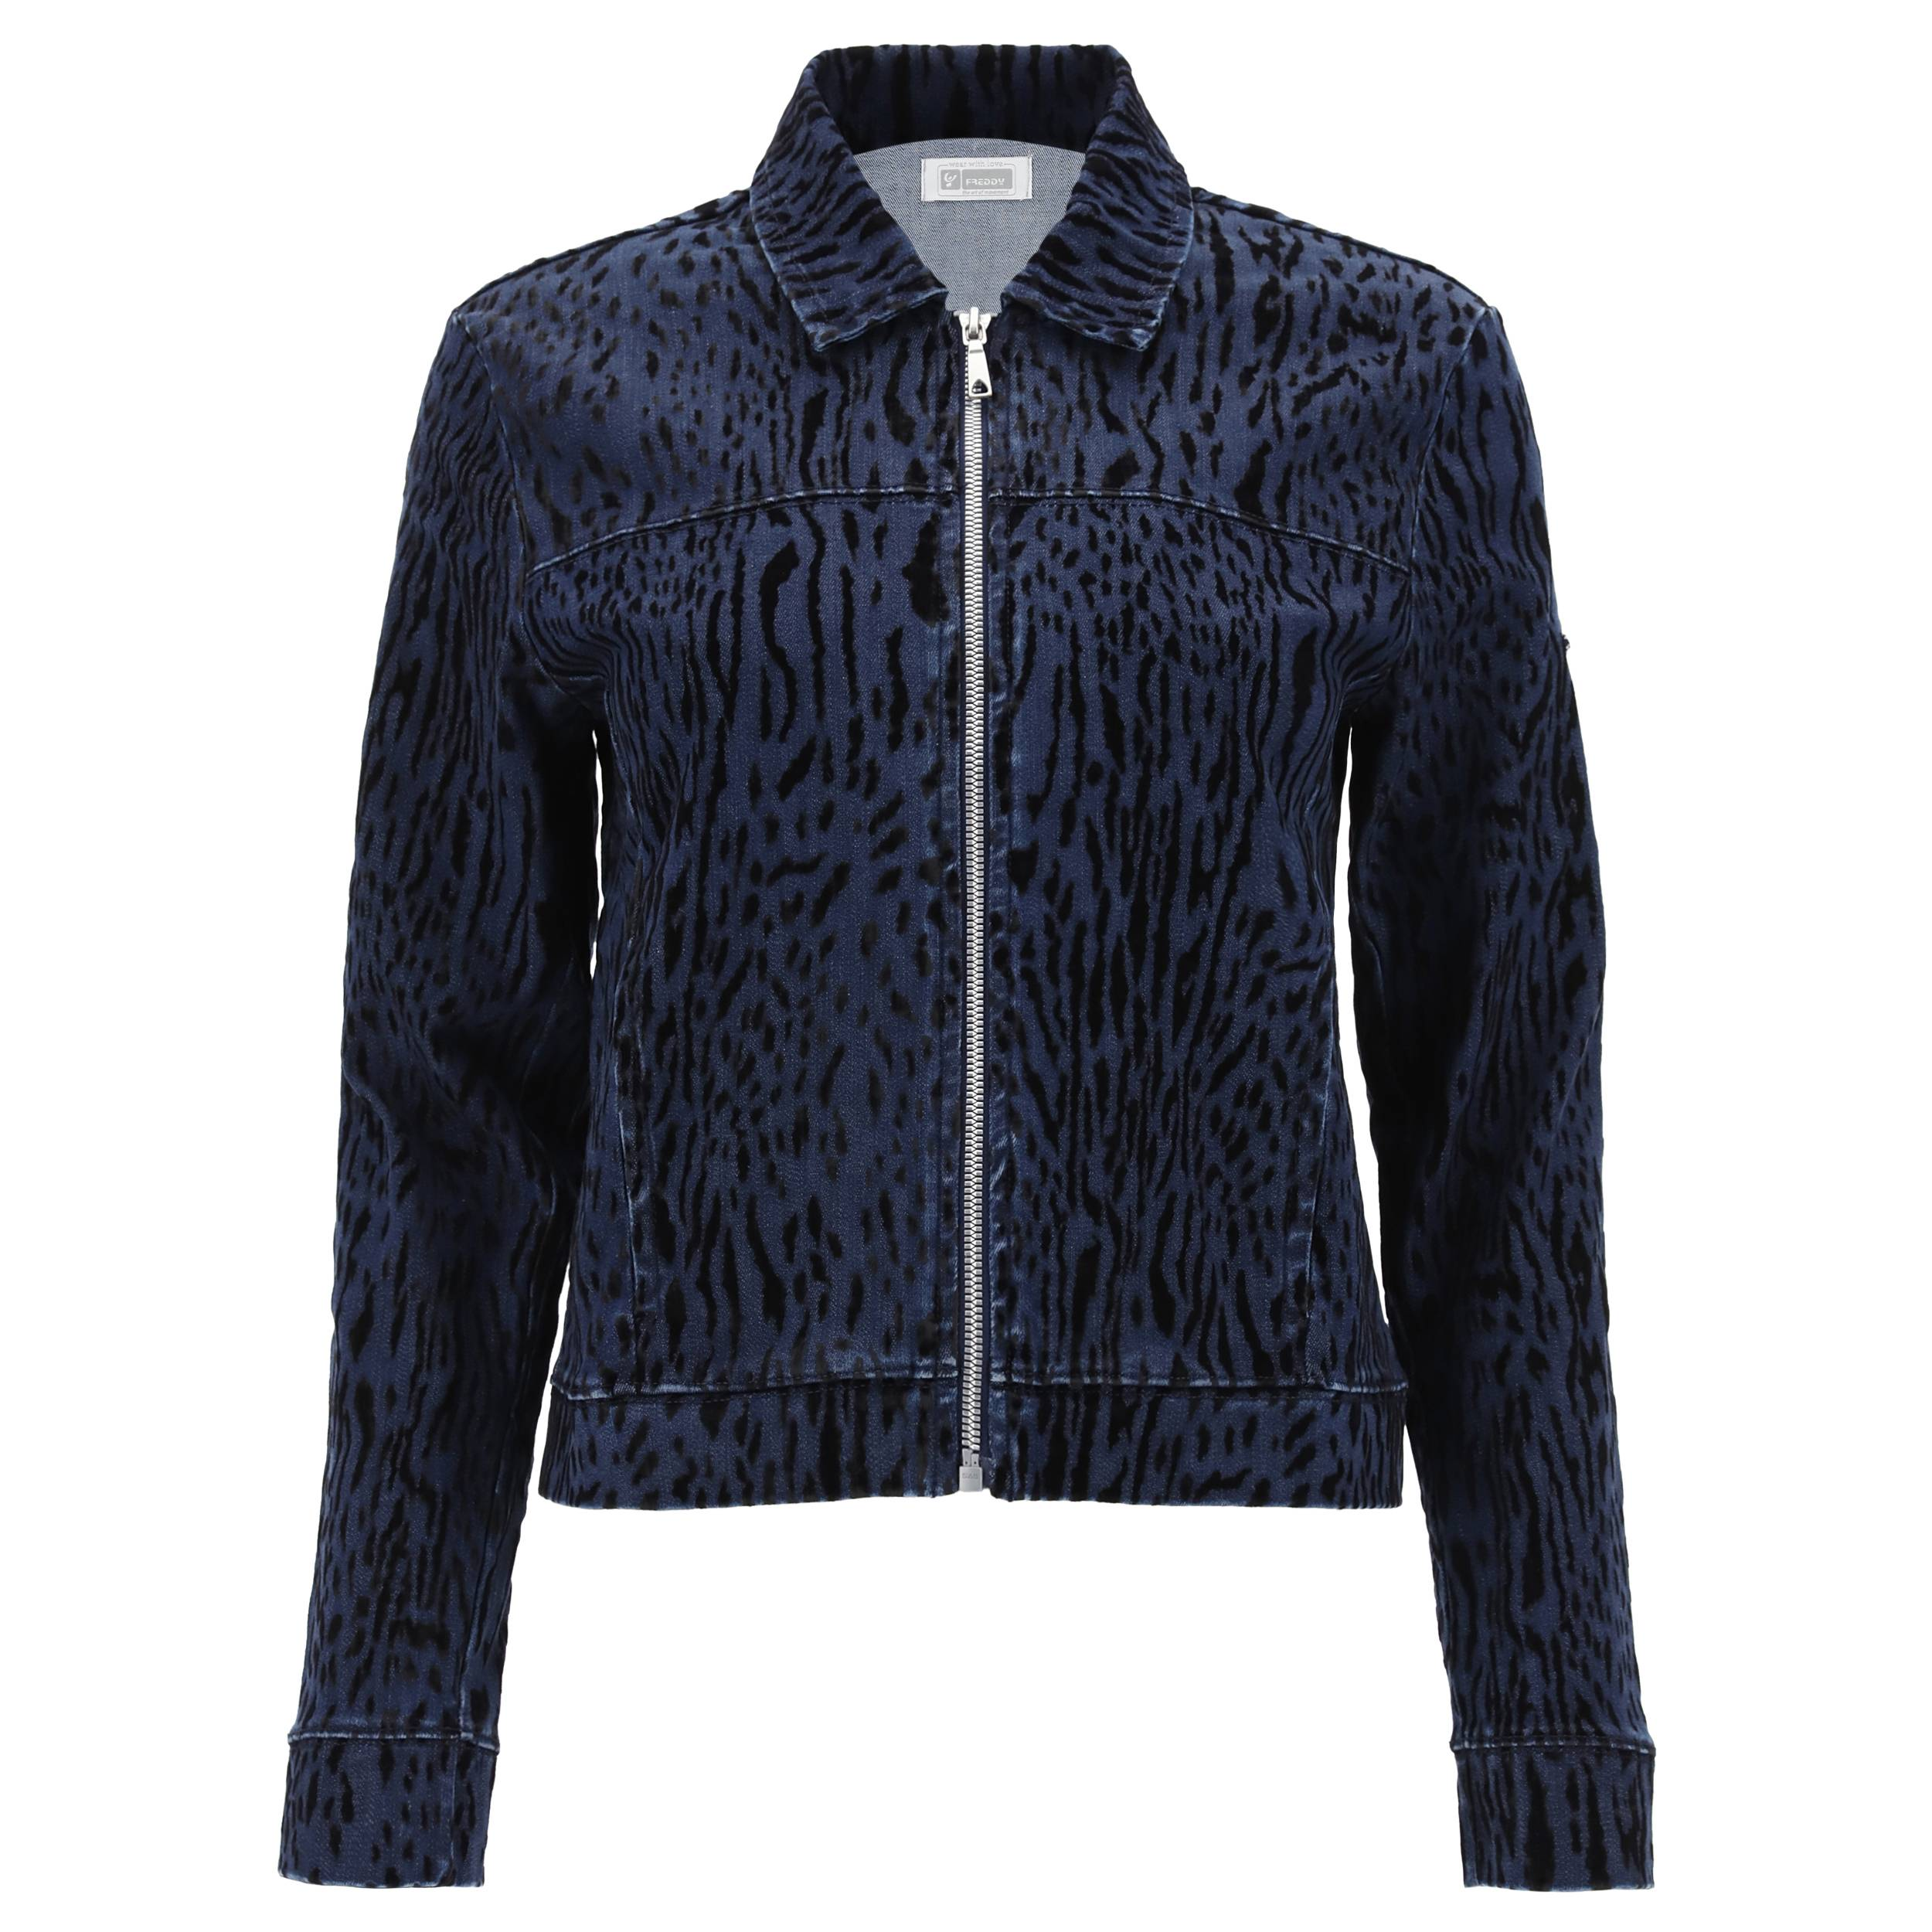 freddy giacca donna in denim animalier con zip jeans scuro-cuciture in tono